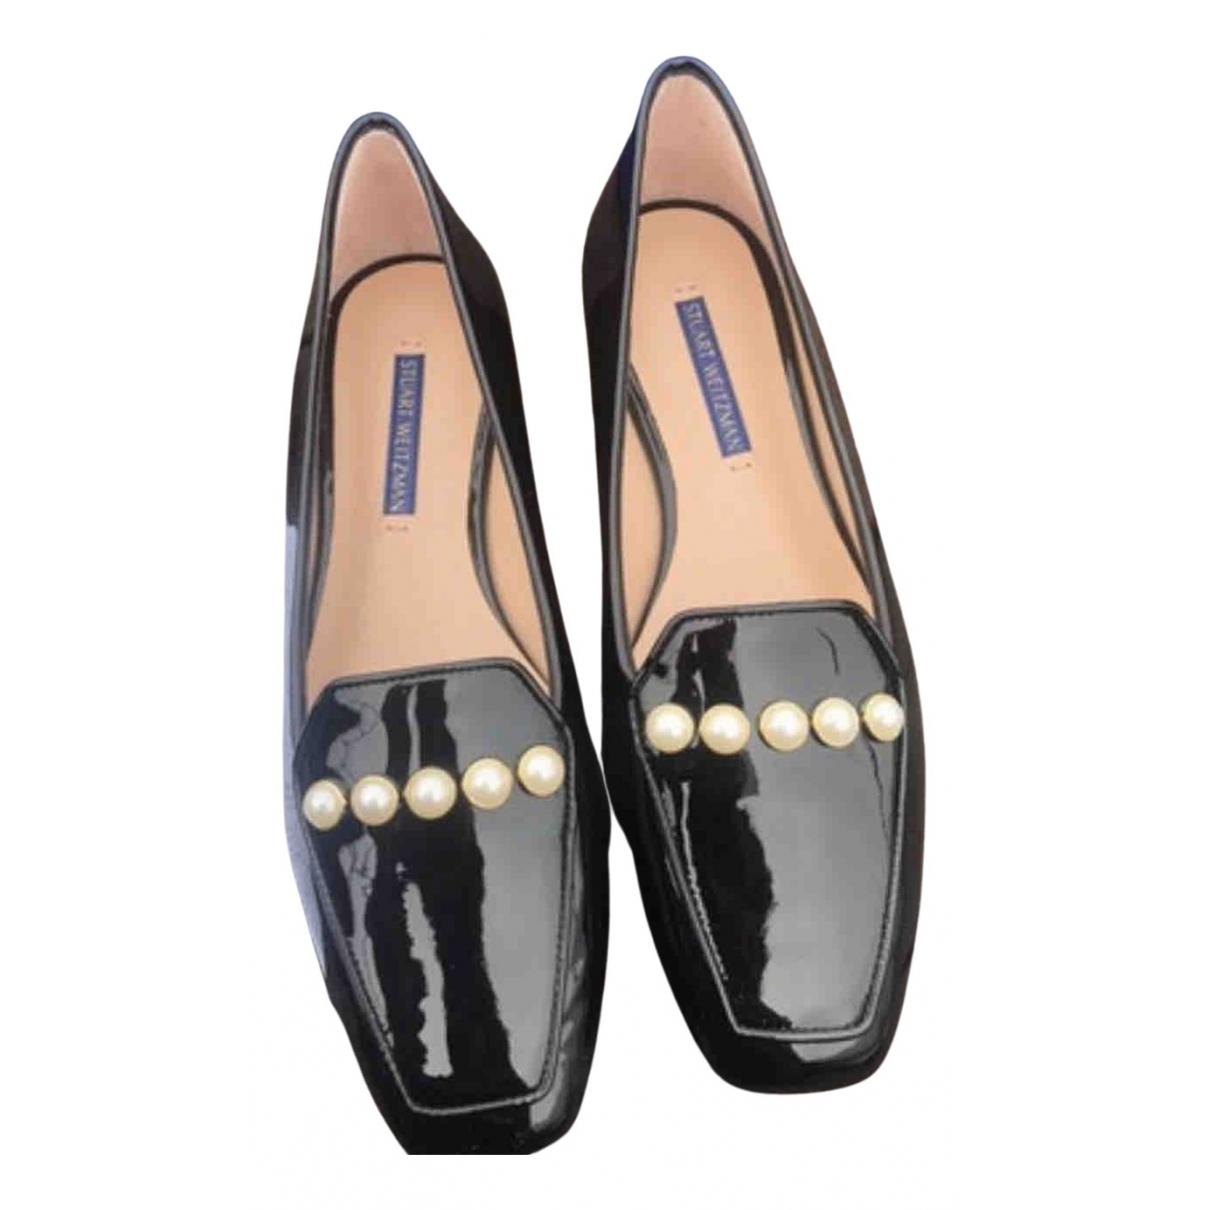 Stuart Weitzman \N Black Patent leather Flats for Women 38.5 EU